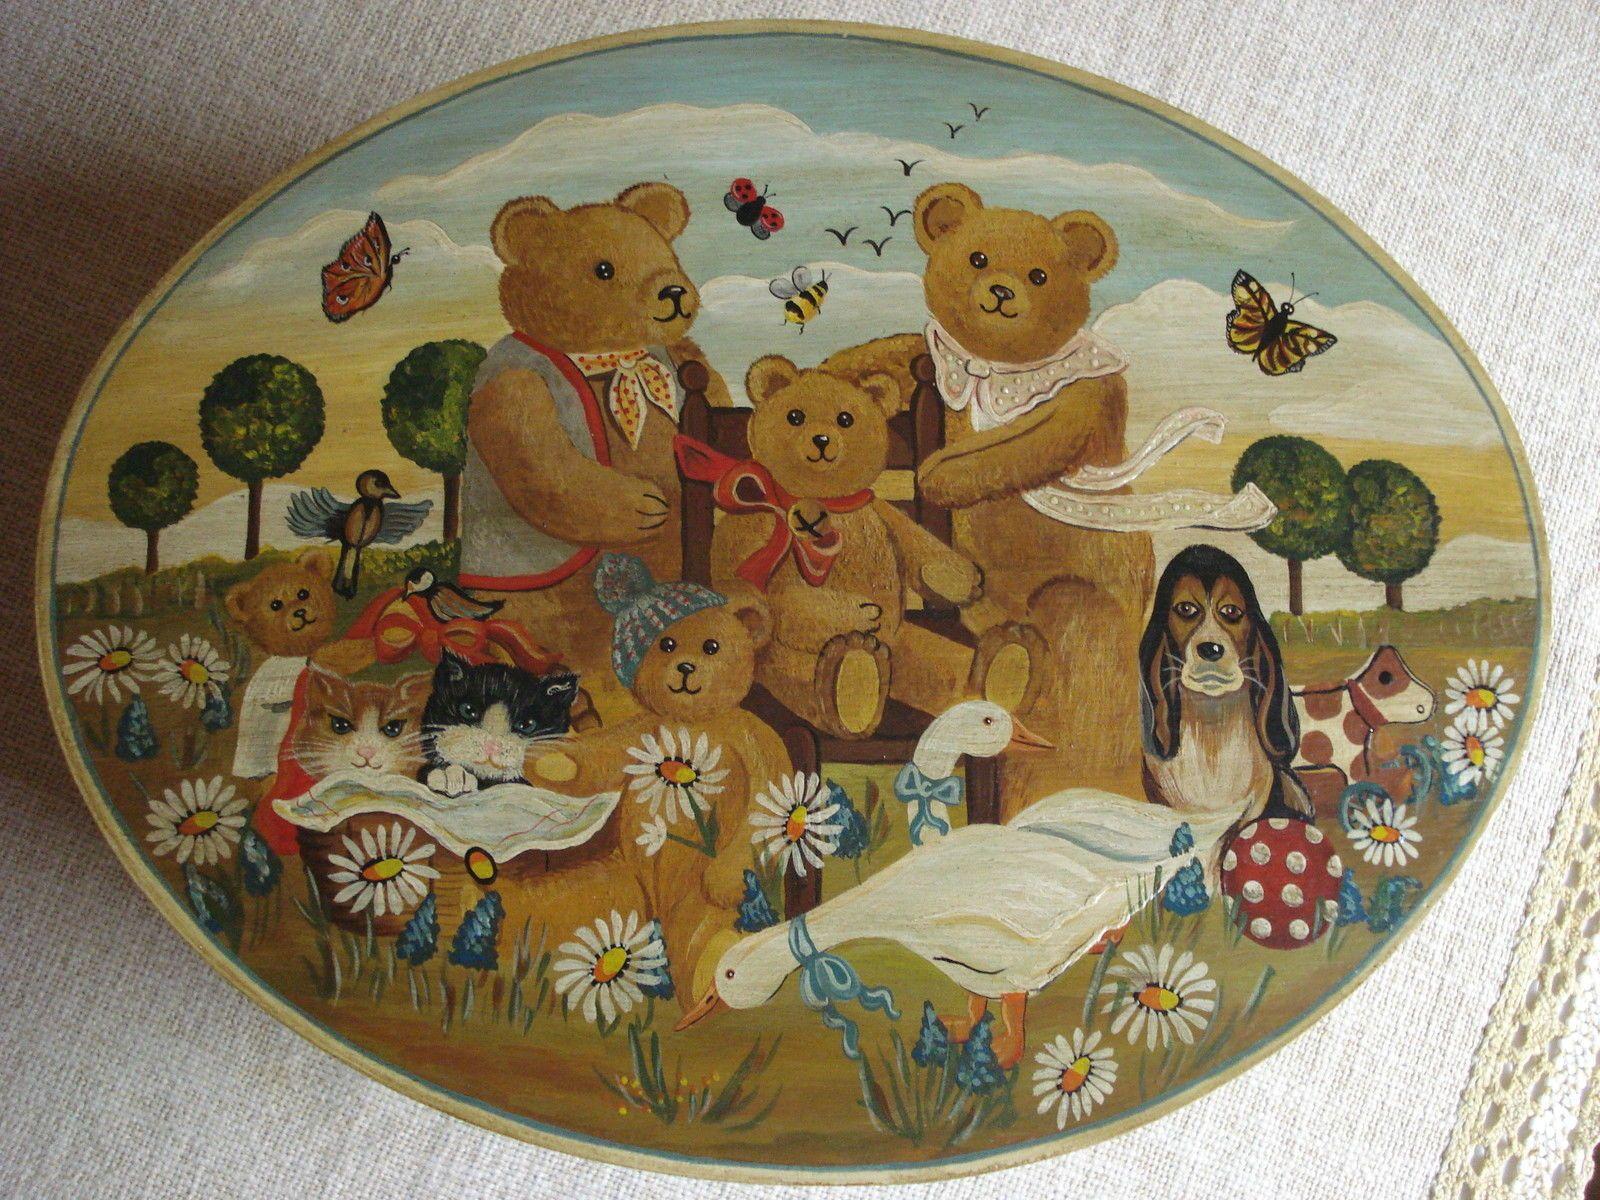 Phantastisch bemalte Spanschachtel ca. 31x24x14 cm, Bärenmotiv, top erhalten | eBay